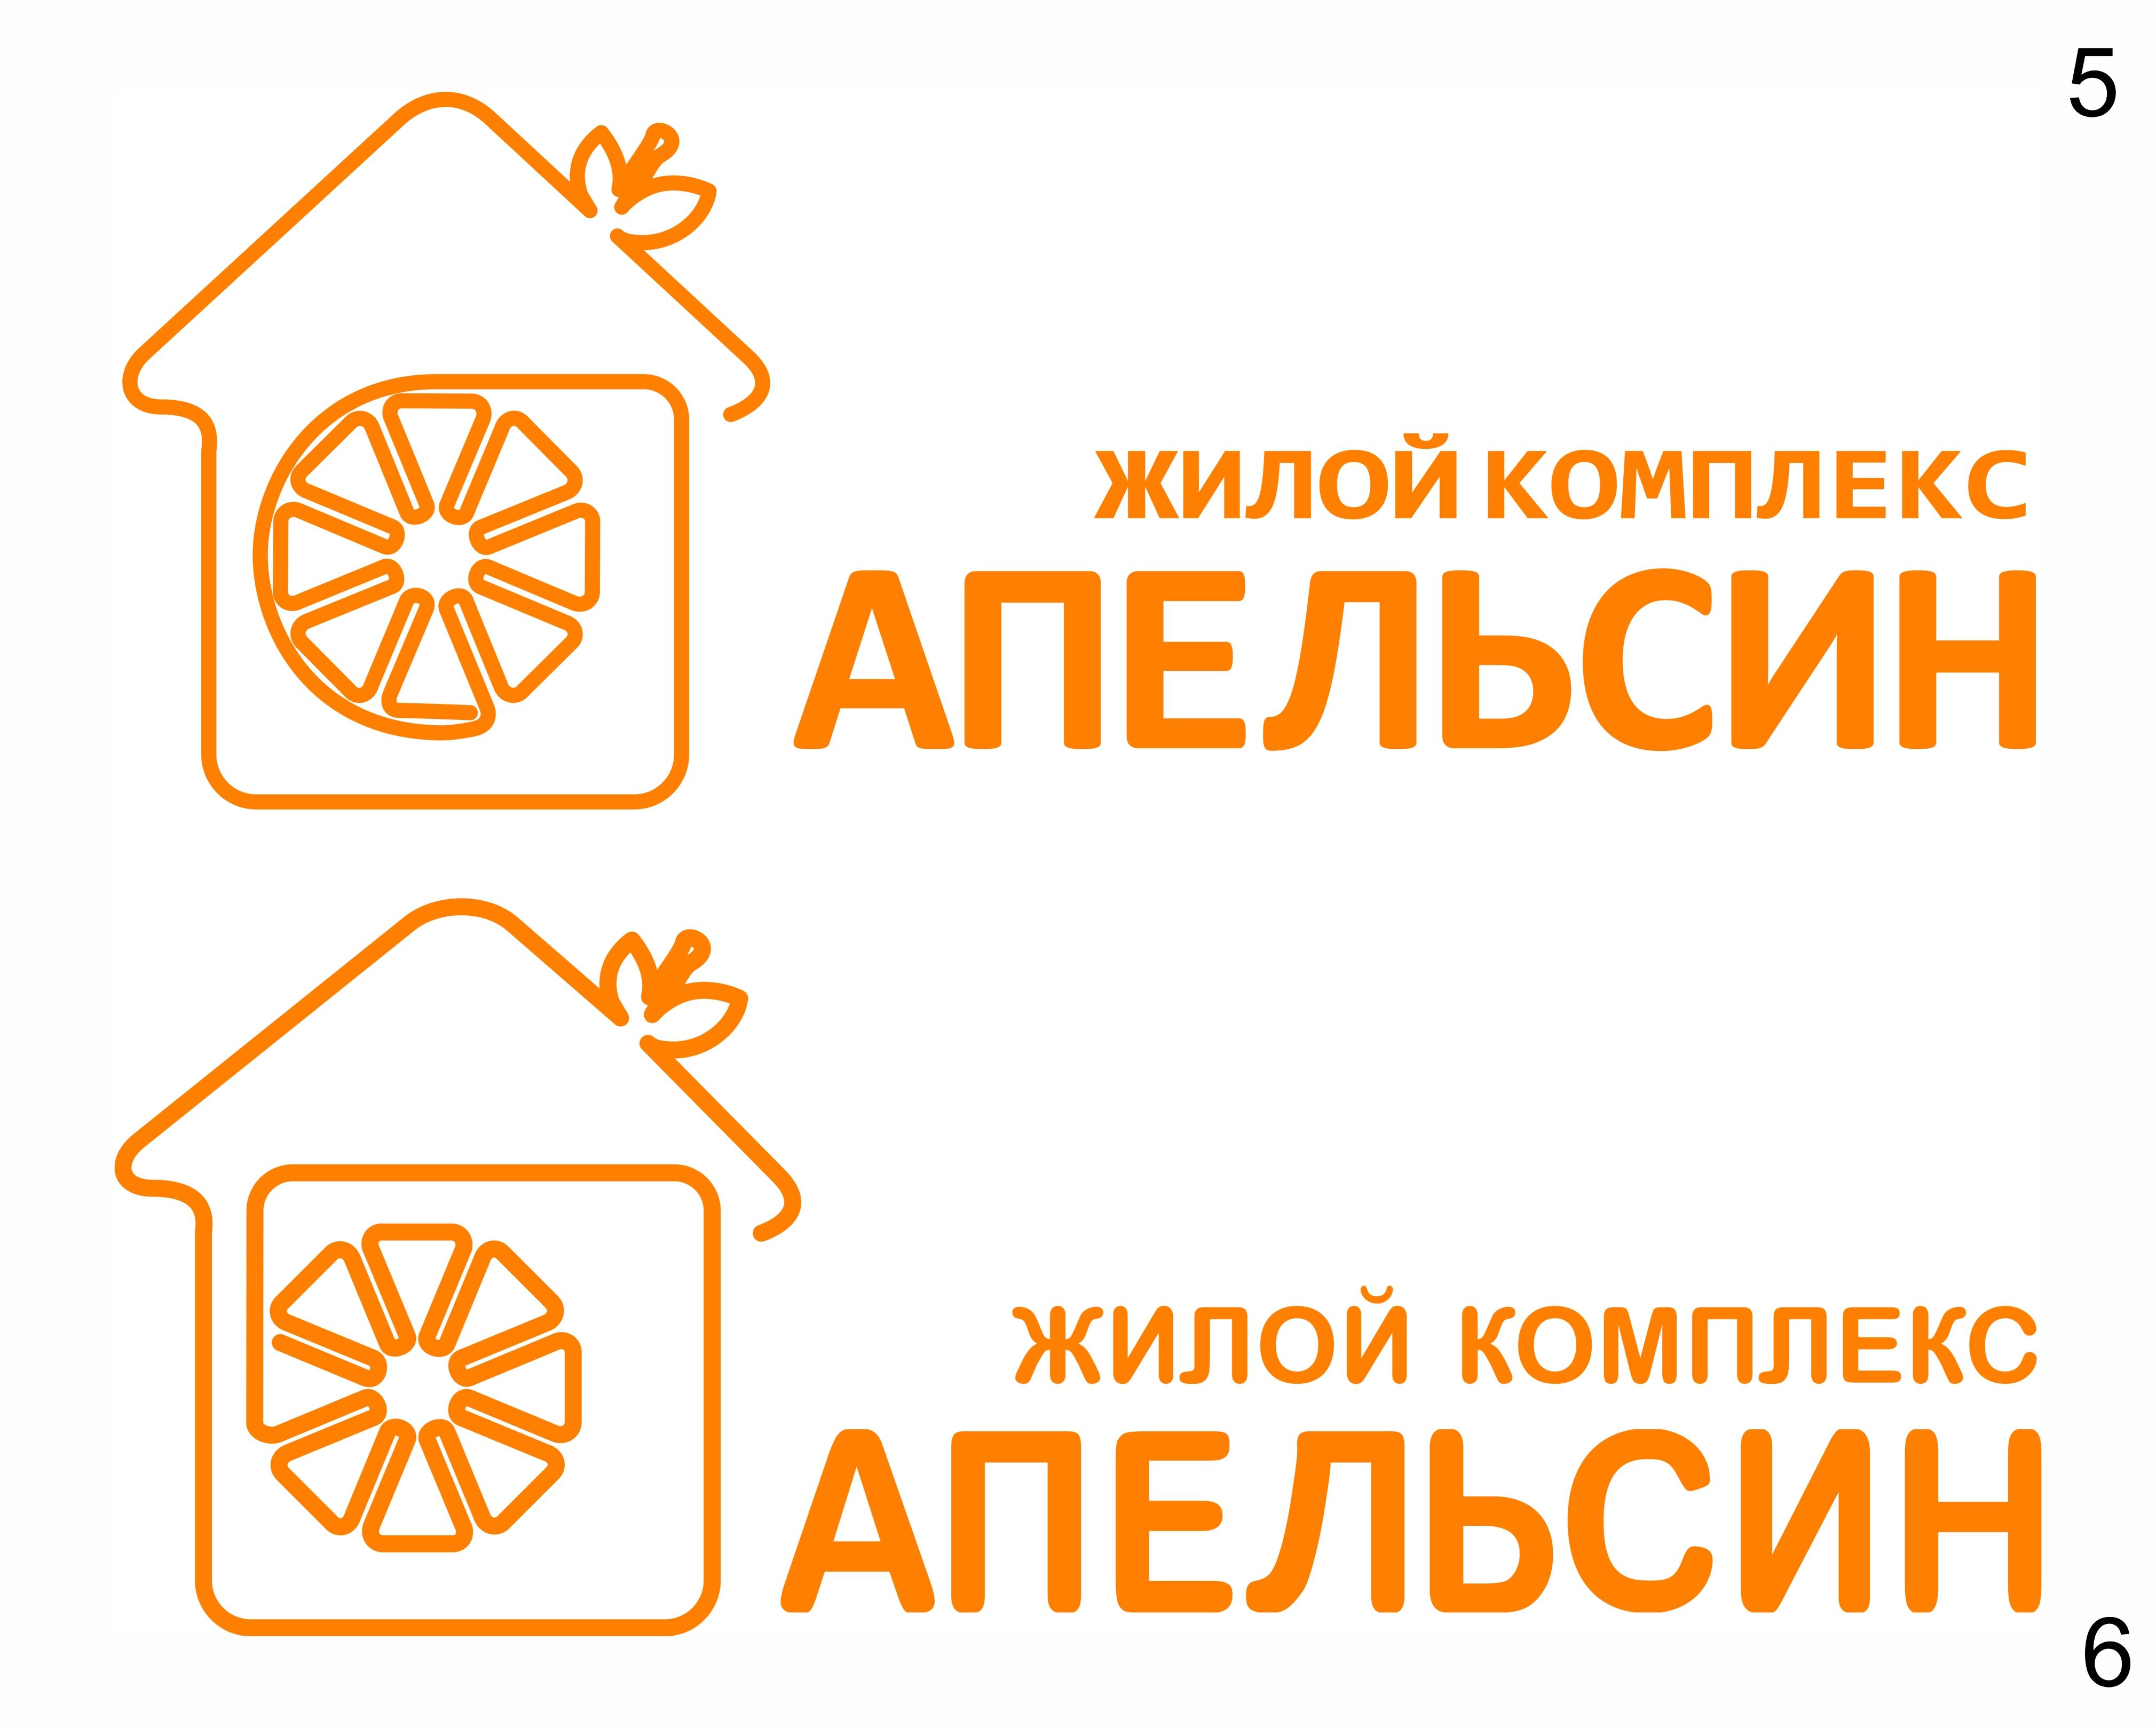 Логотип и фирменный стиль фото f_4805a6847dbc2939.jpg